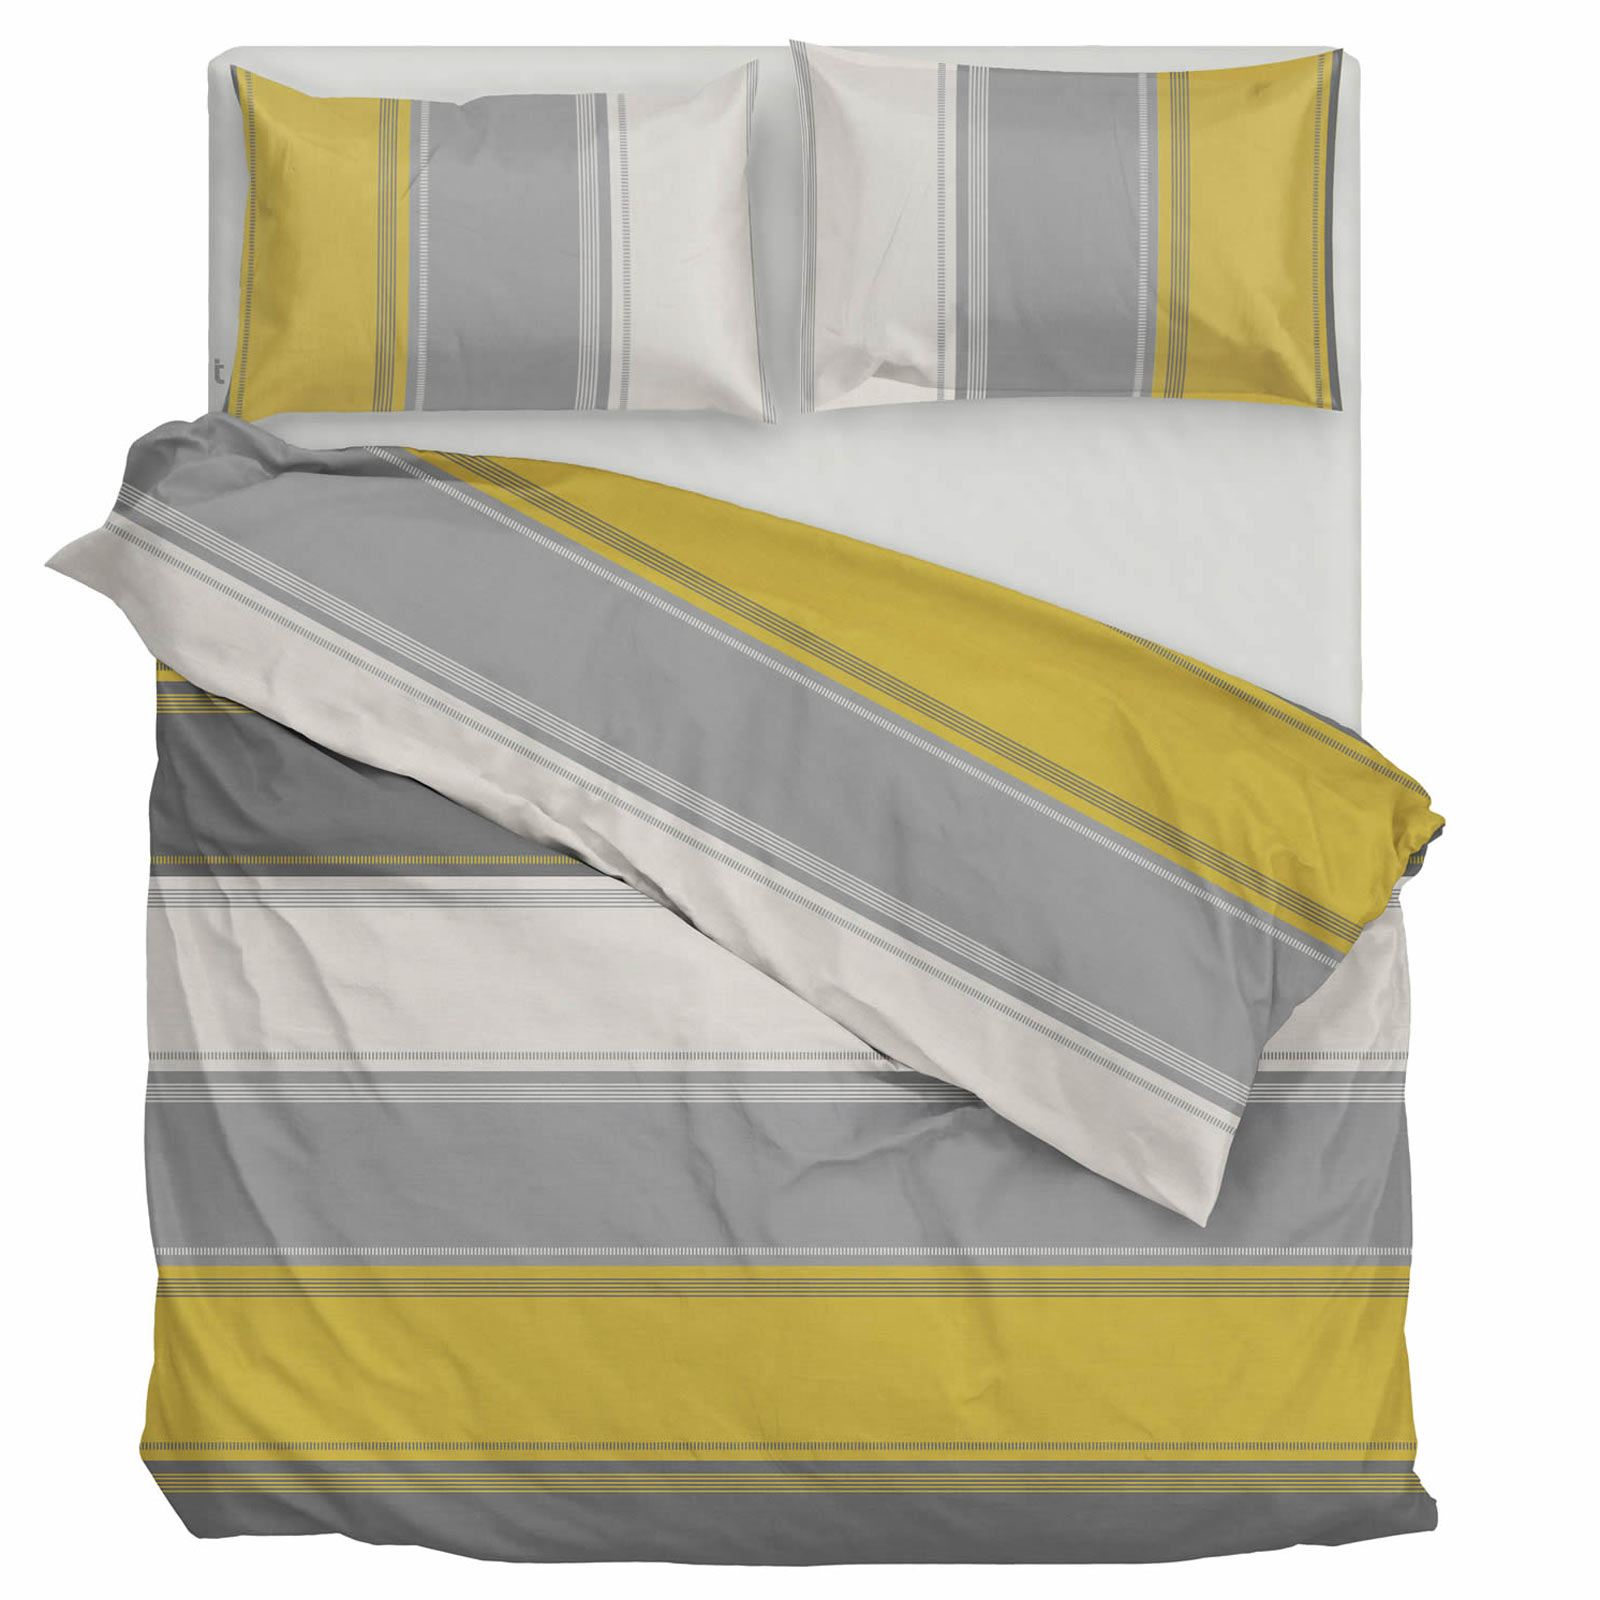 Ochre Duvet Cover Yellow Mustard Printed Quilt Set Bedding